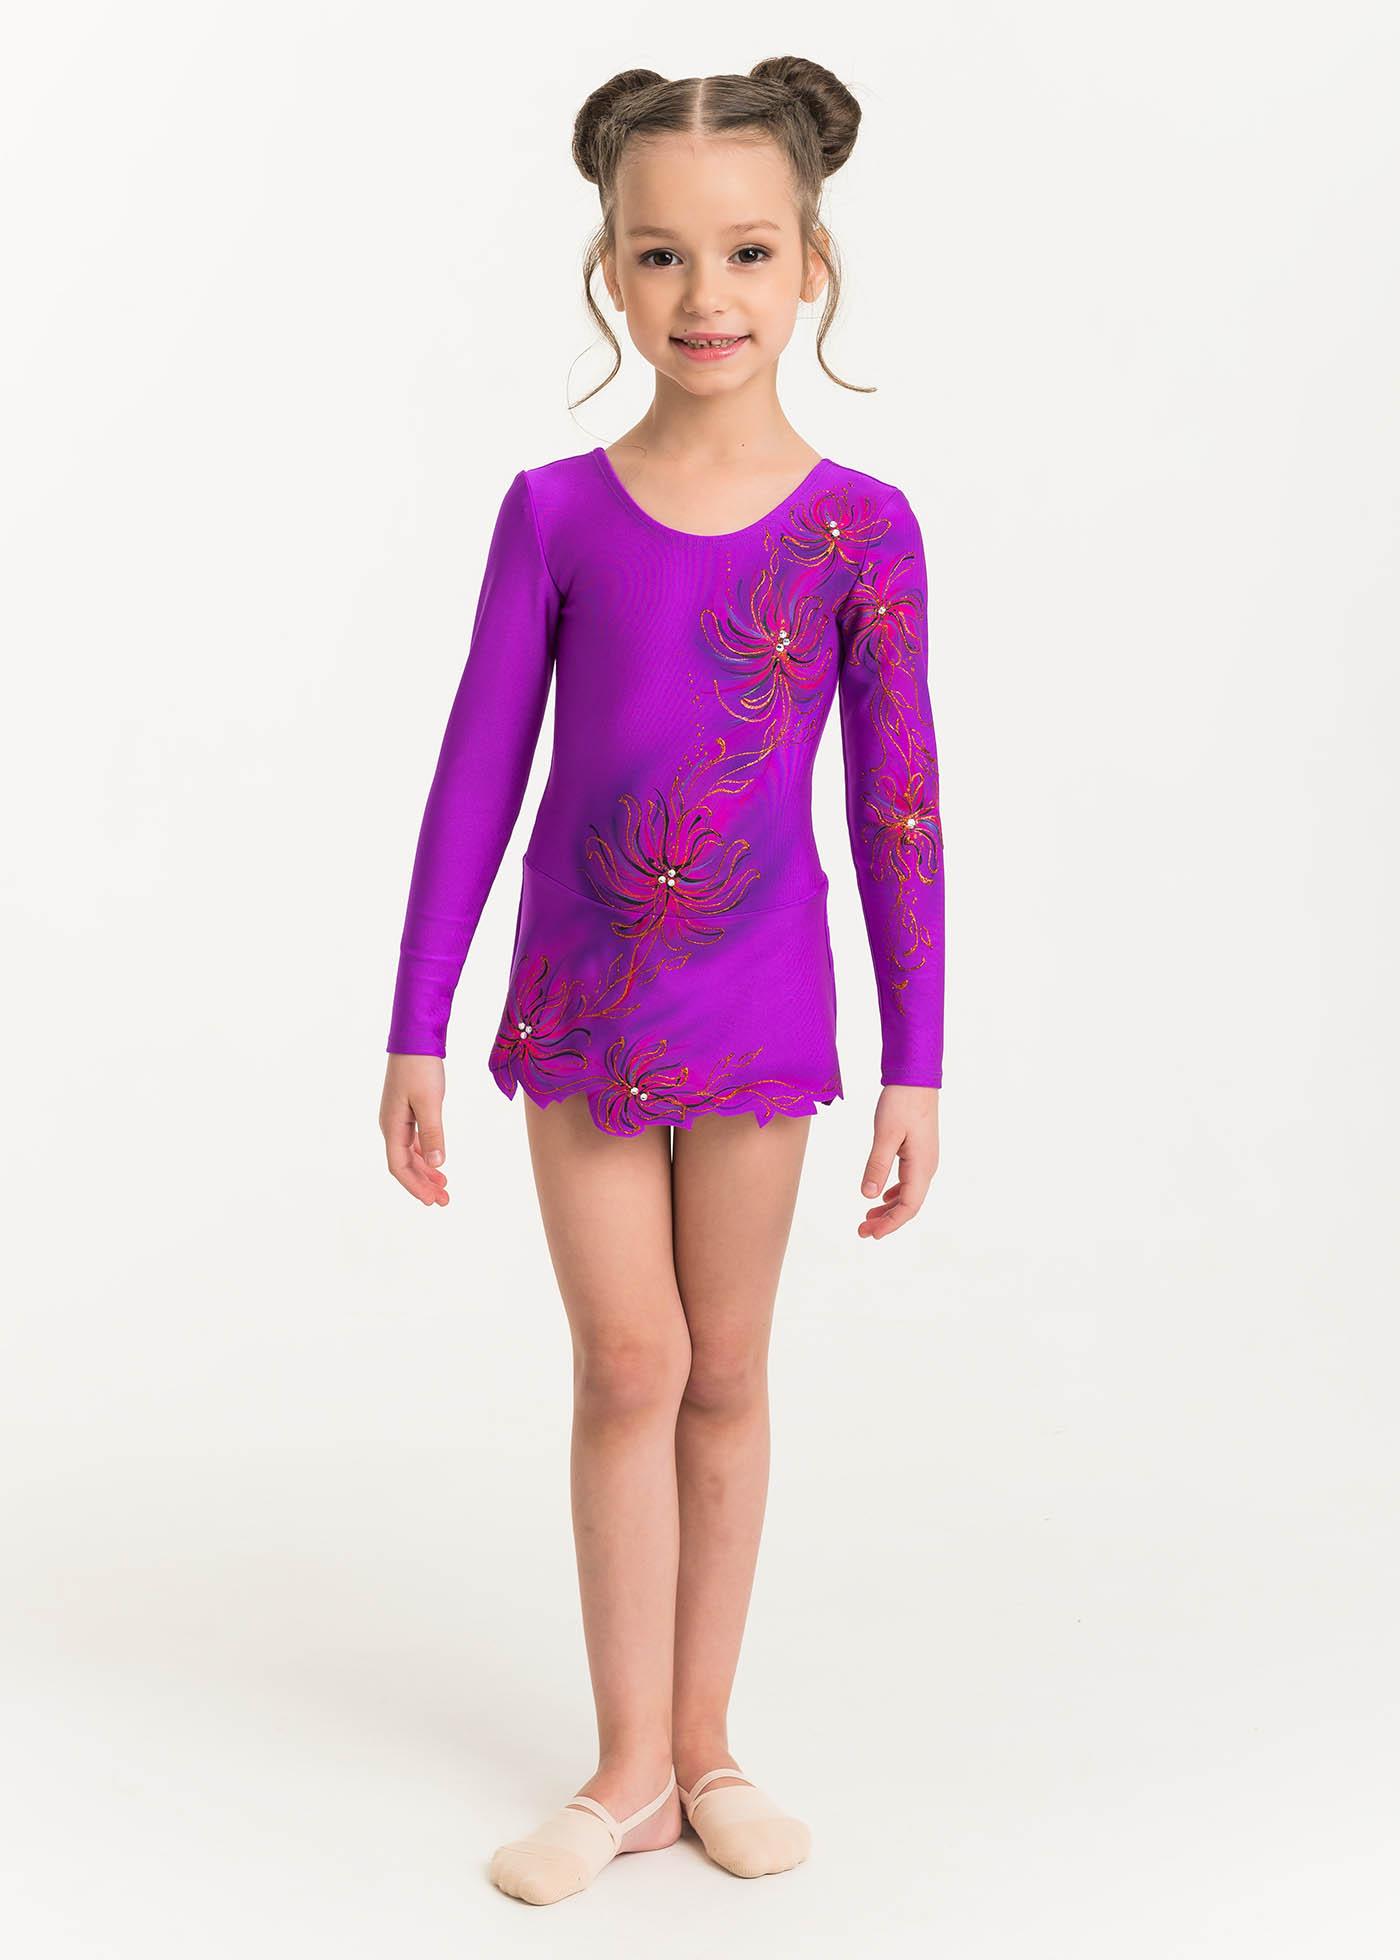 Rhythmic gymnastics, Ava, pic 3